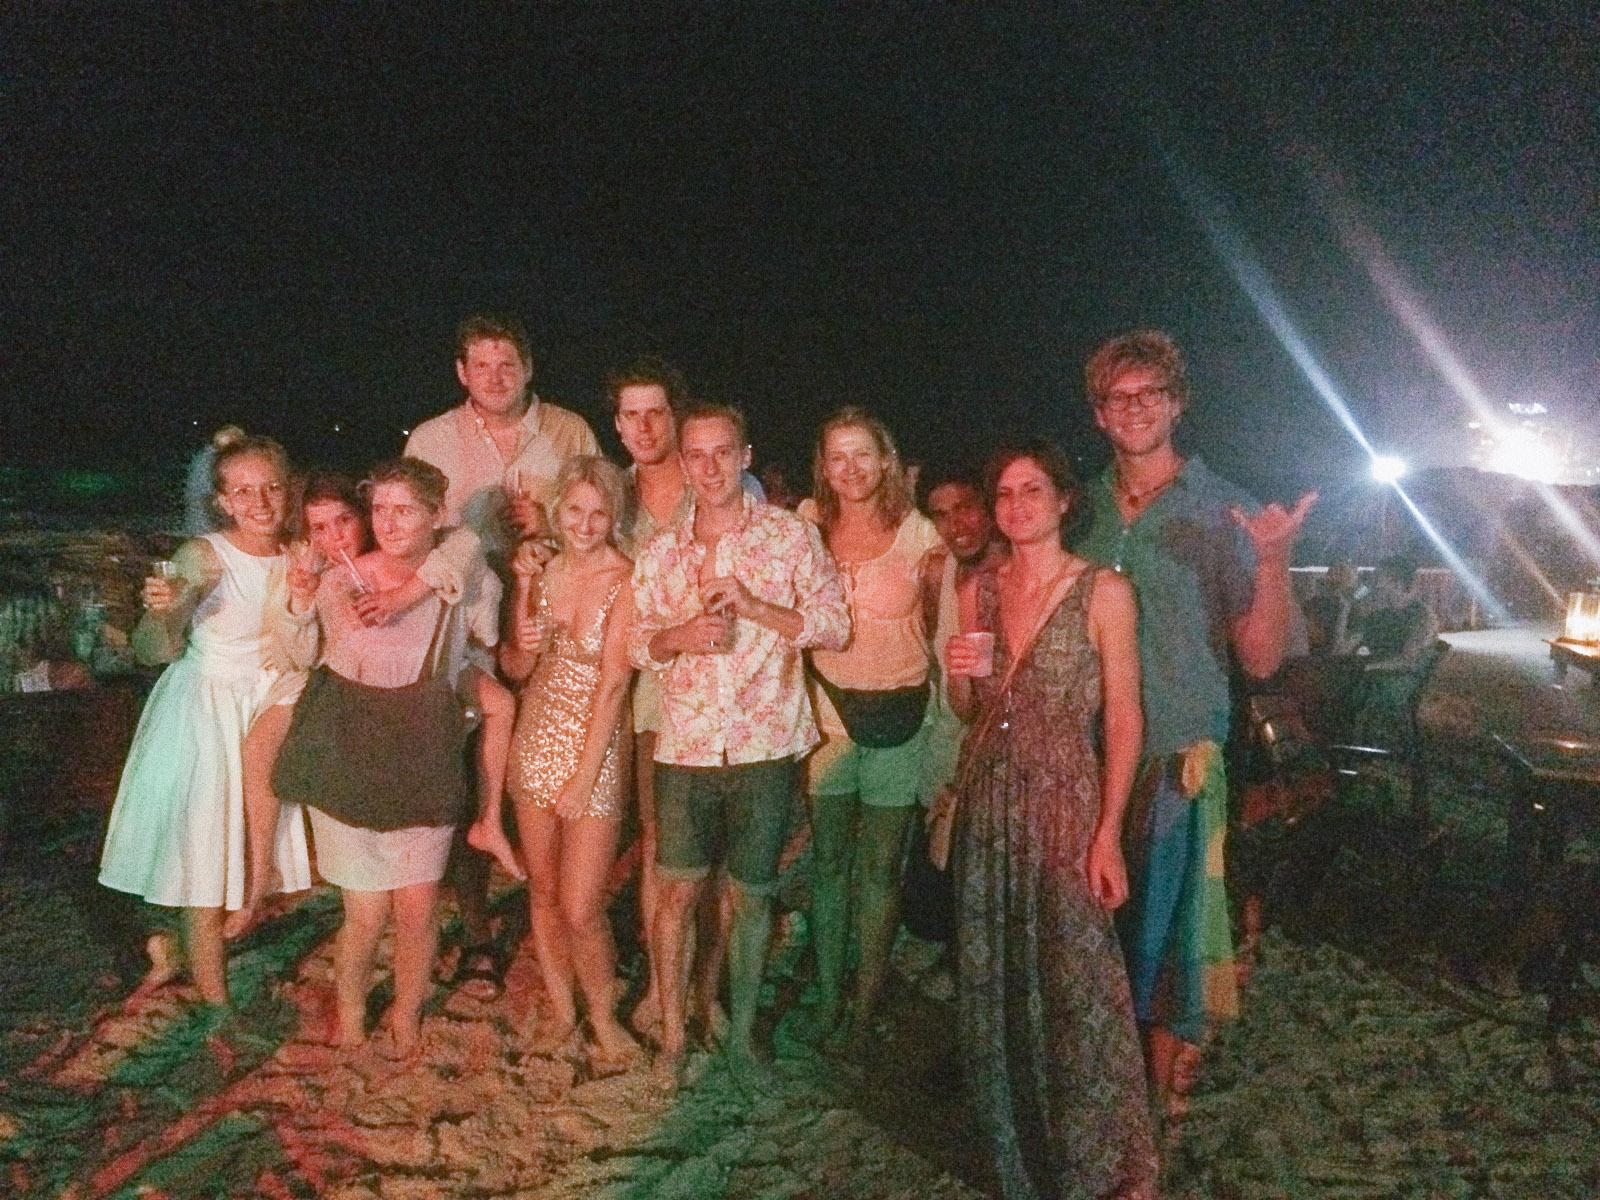 Sunshinestories-surf-travel-blog-IMG_2249